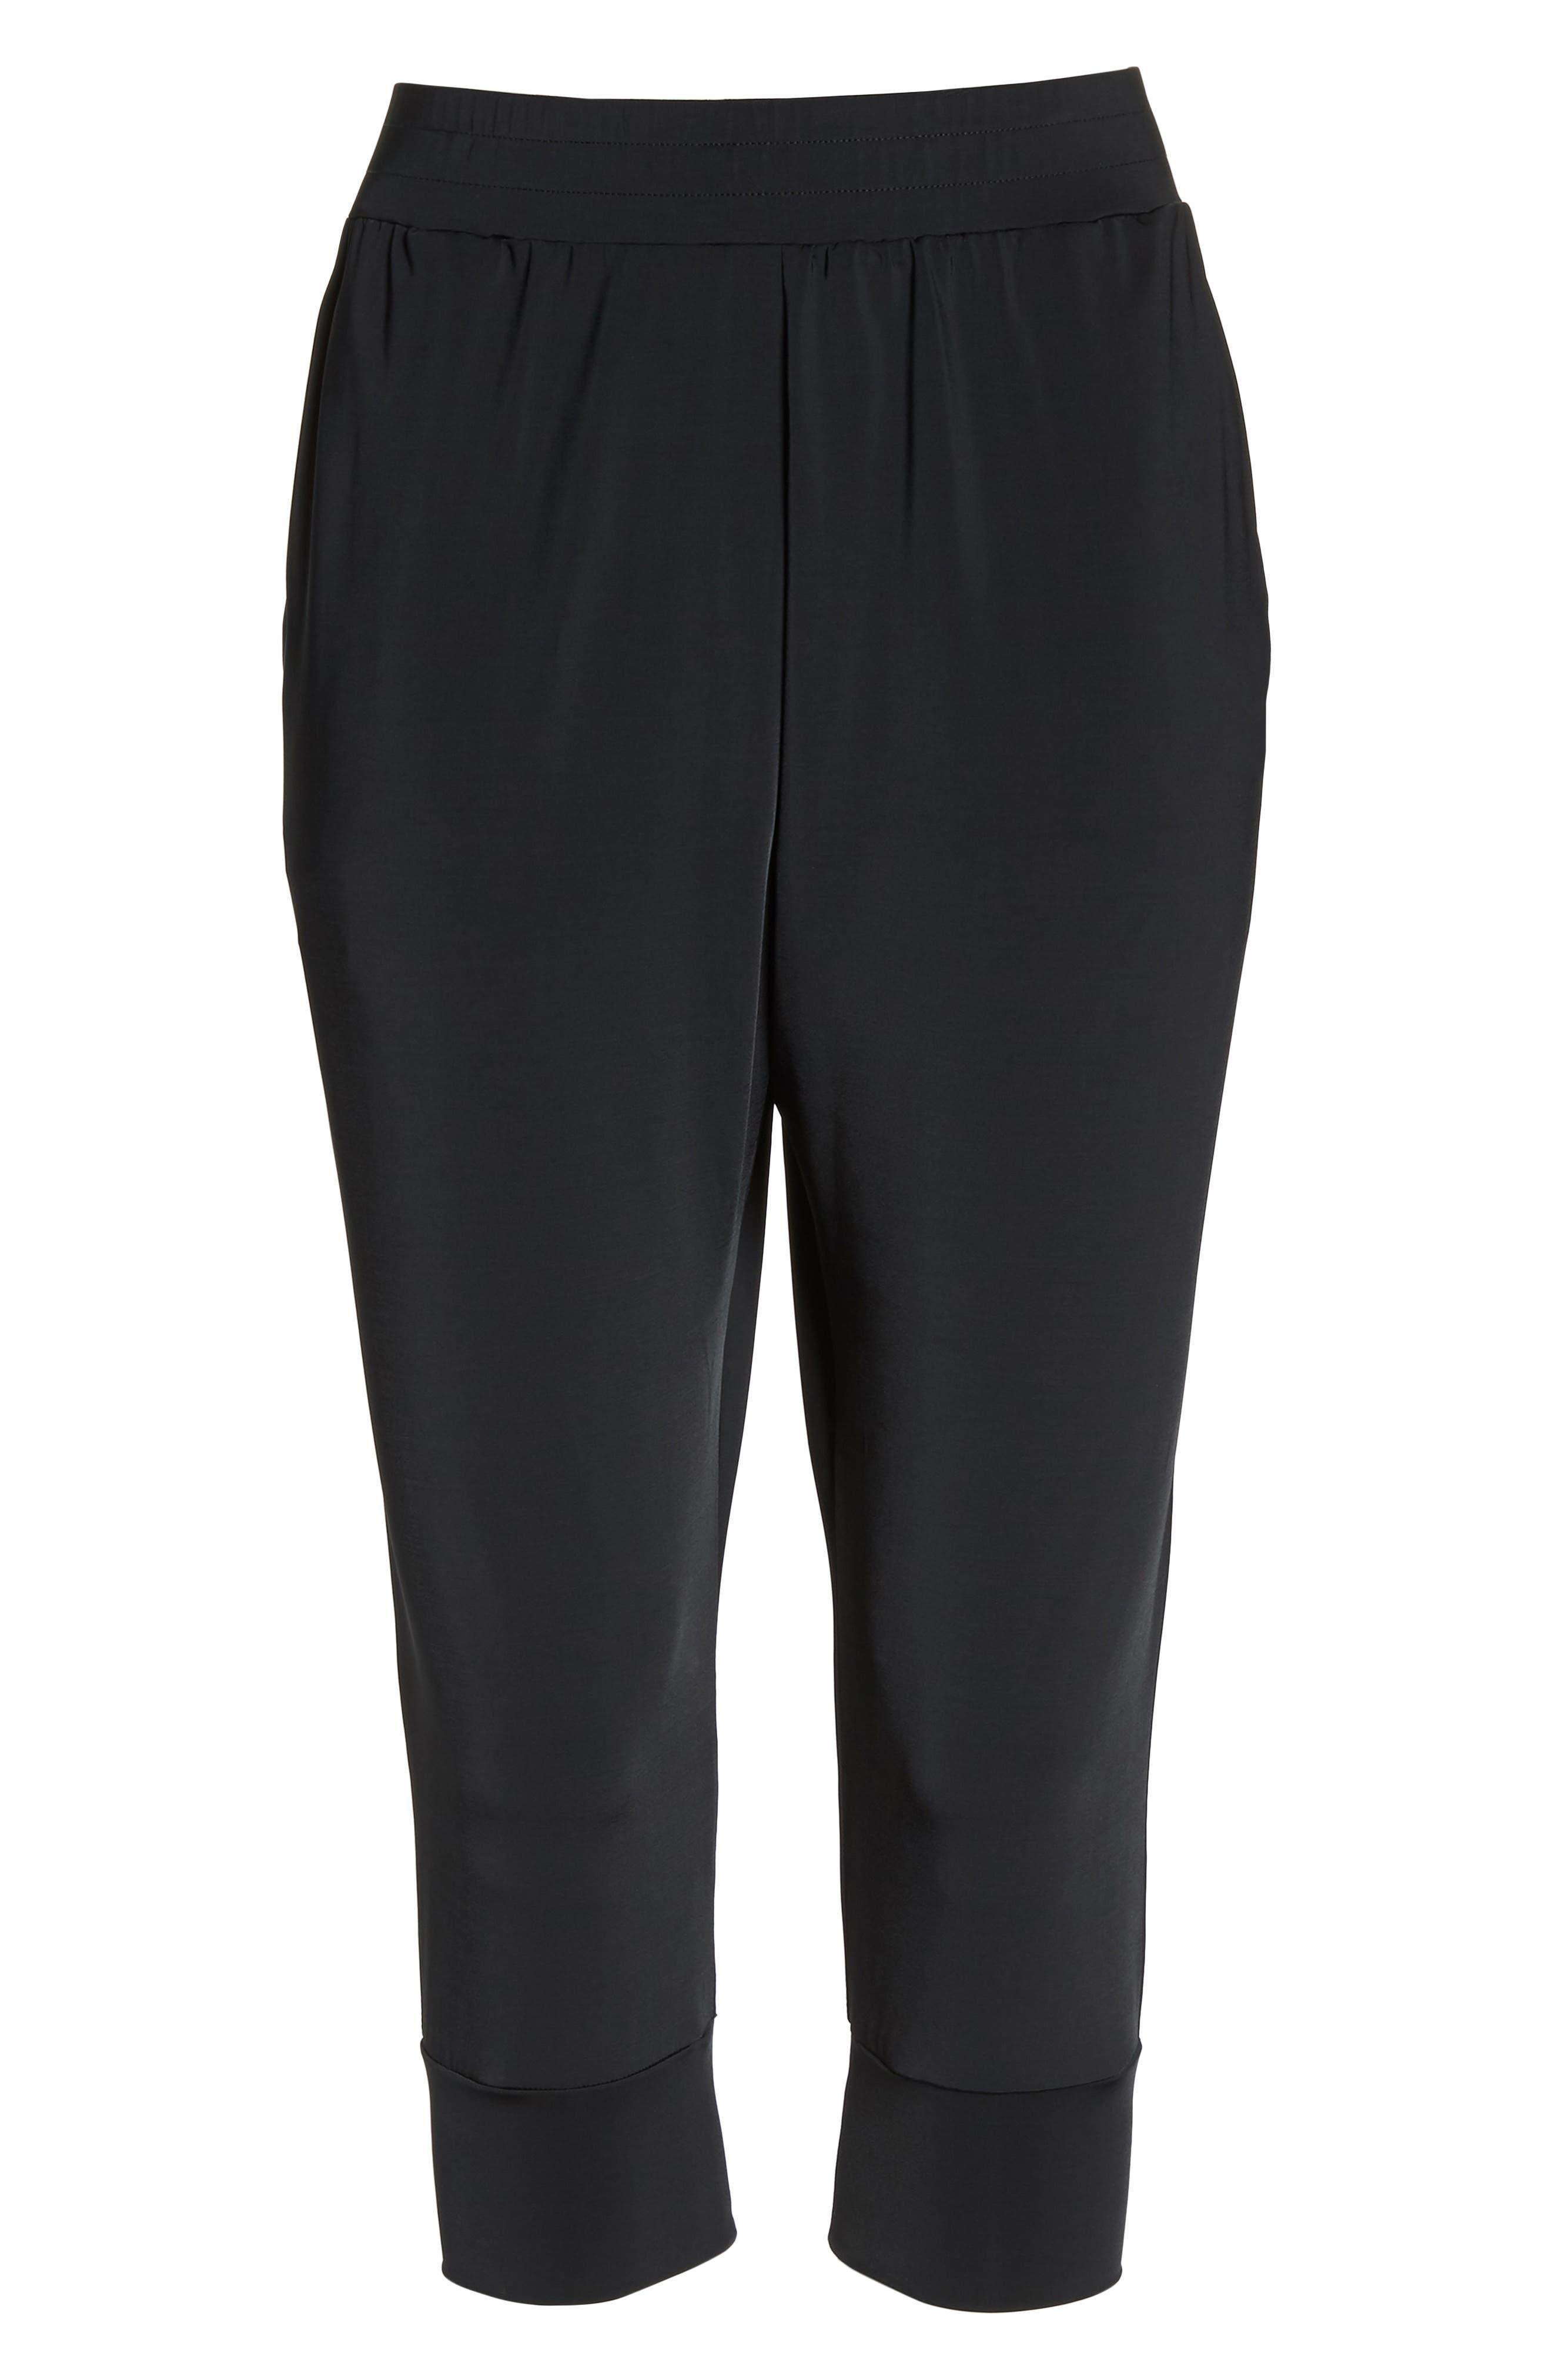 Dry Touch Training Pants,                             Alternate thumbnail 7, color,                             Black/ Black